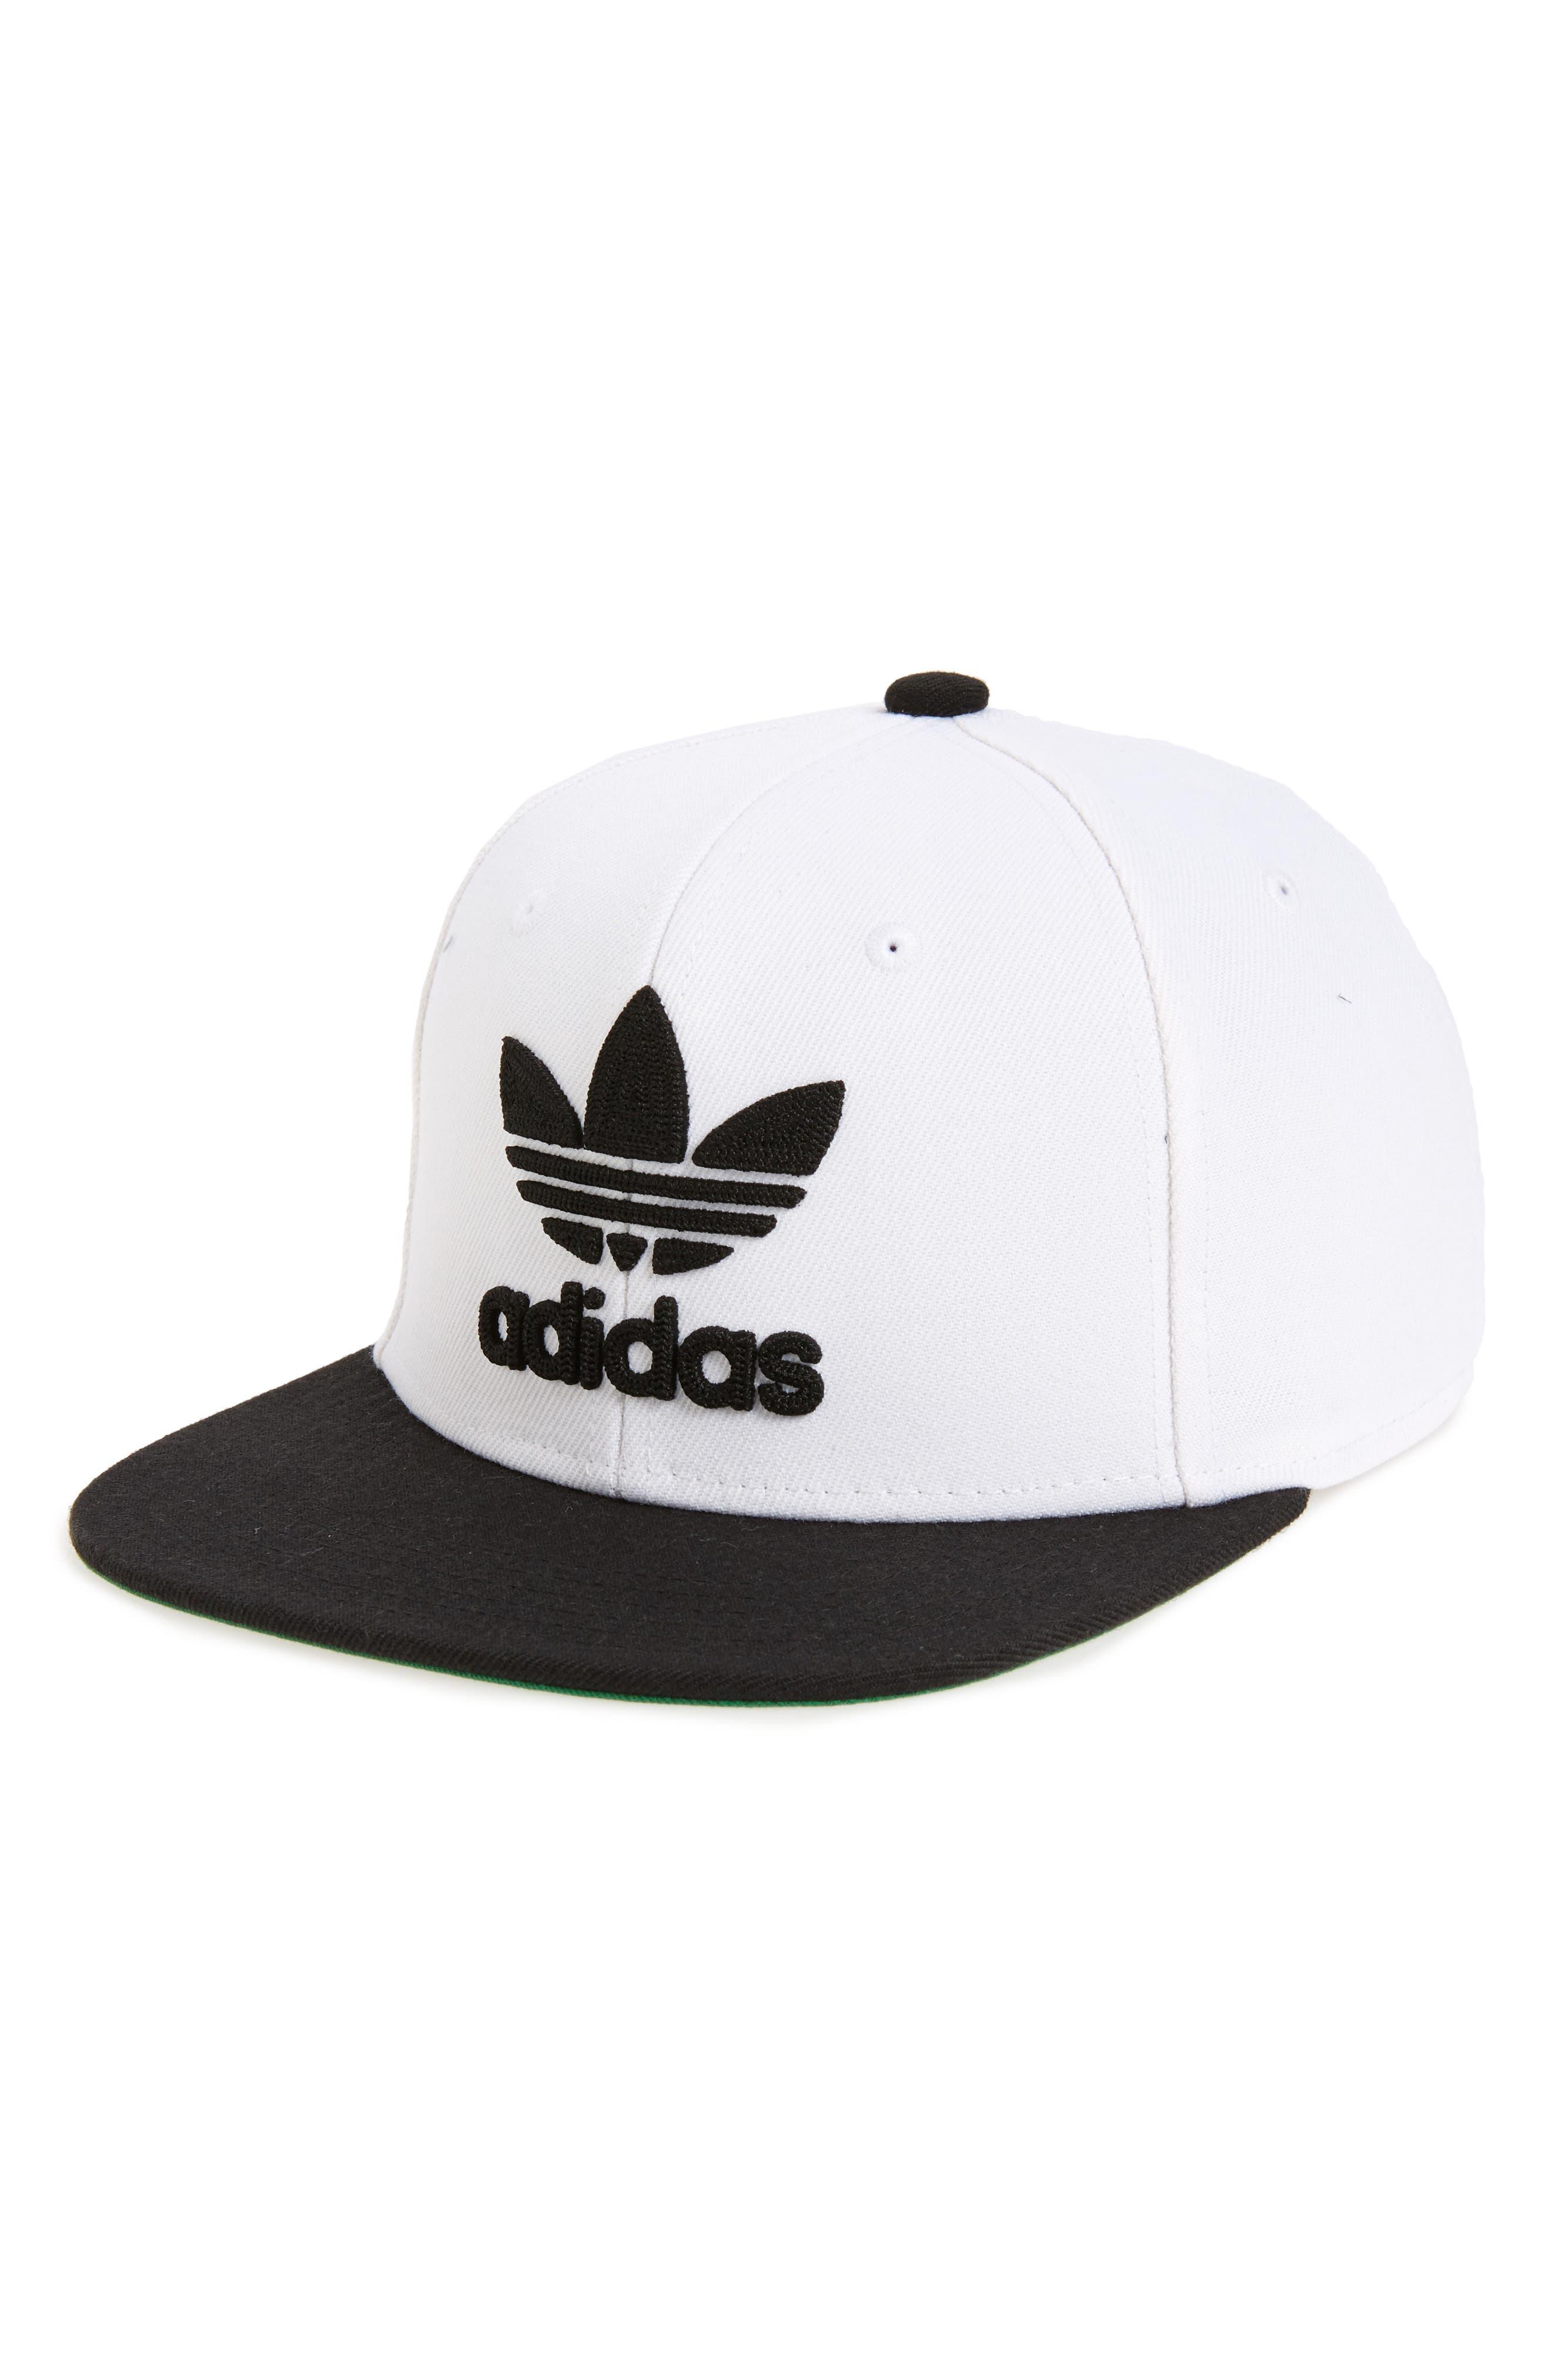 40881a59cbc65 ... discount code for adidas originals mens originals trefoil chain  snapback hat white e15d2 f677a